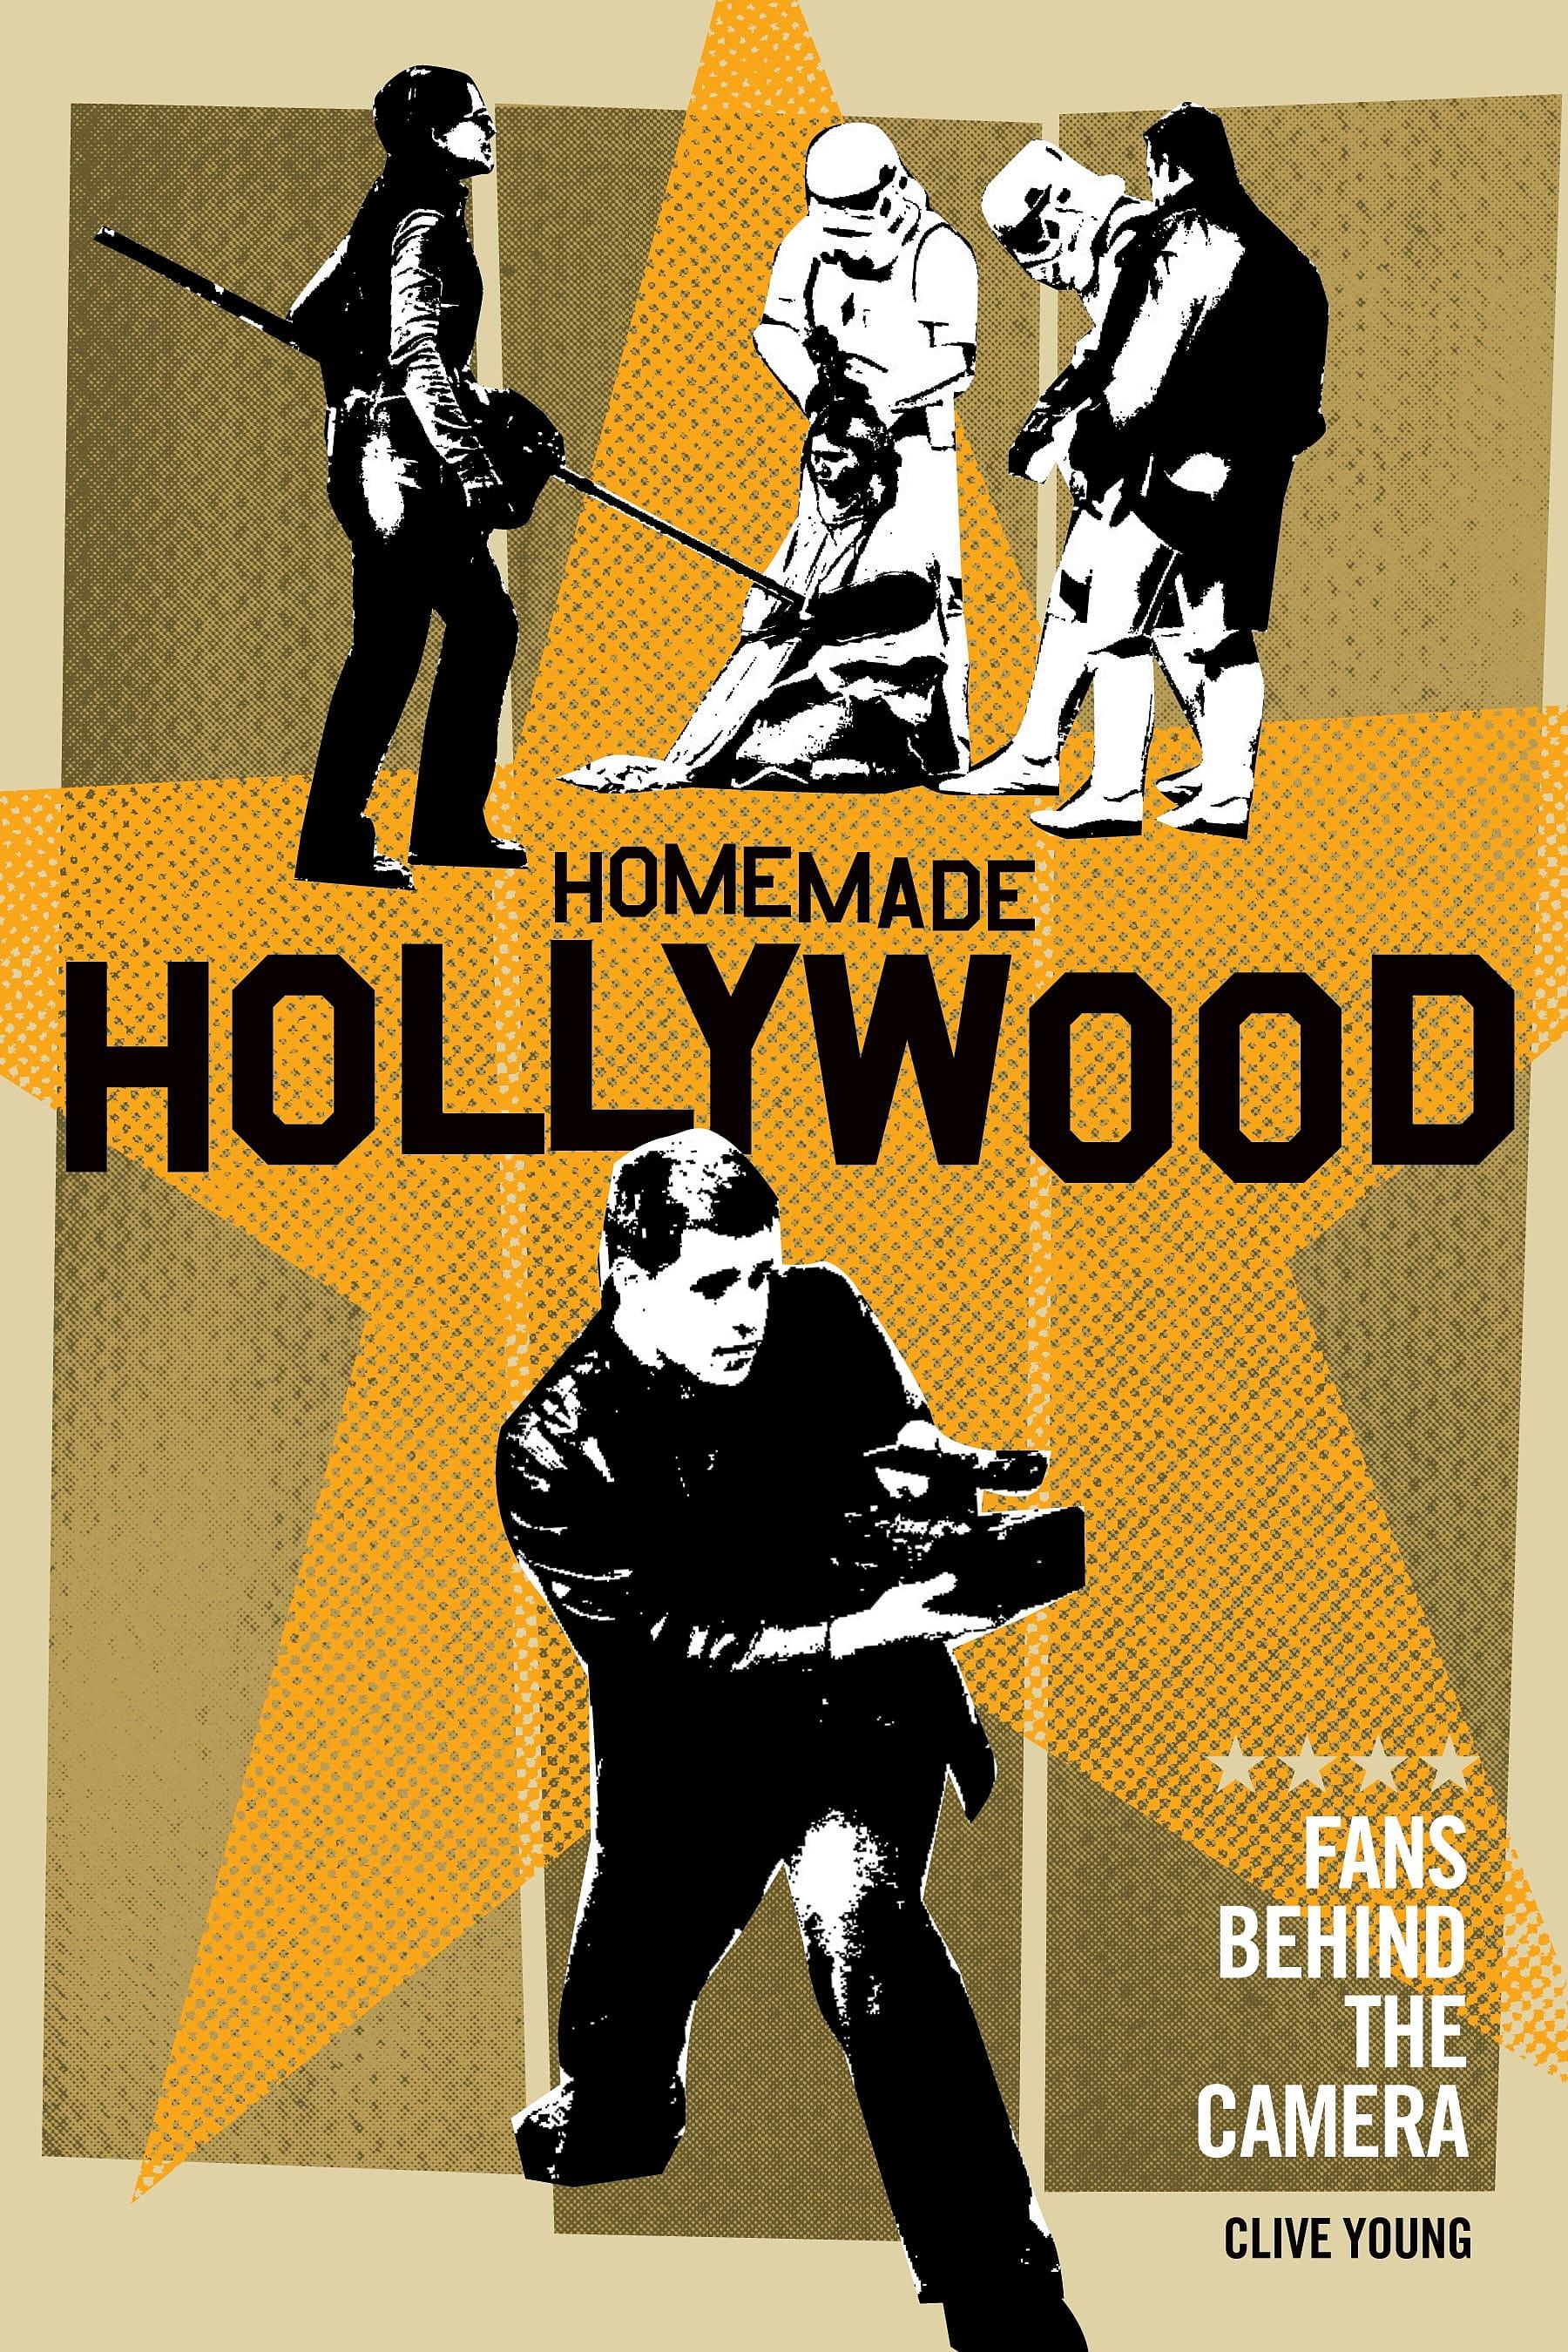 Homemade Hollywood